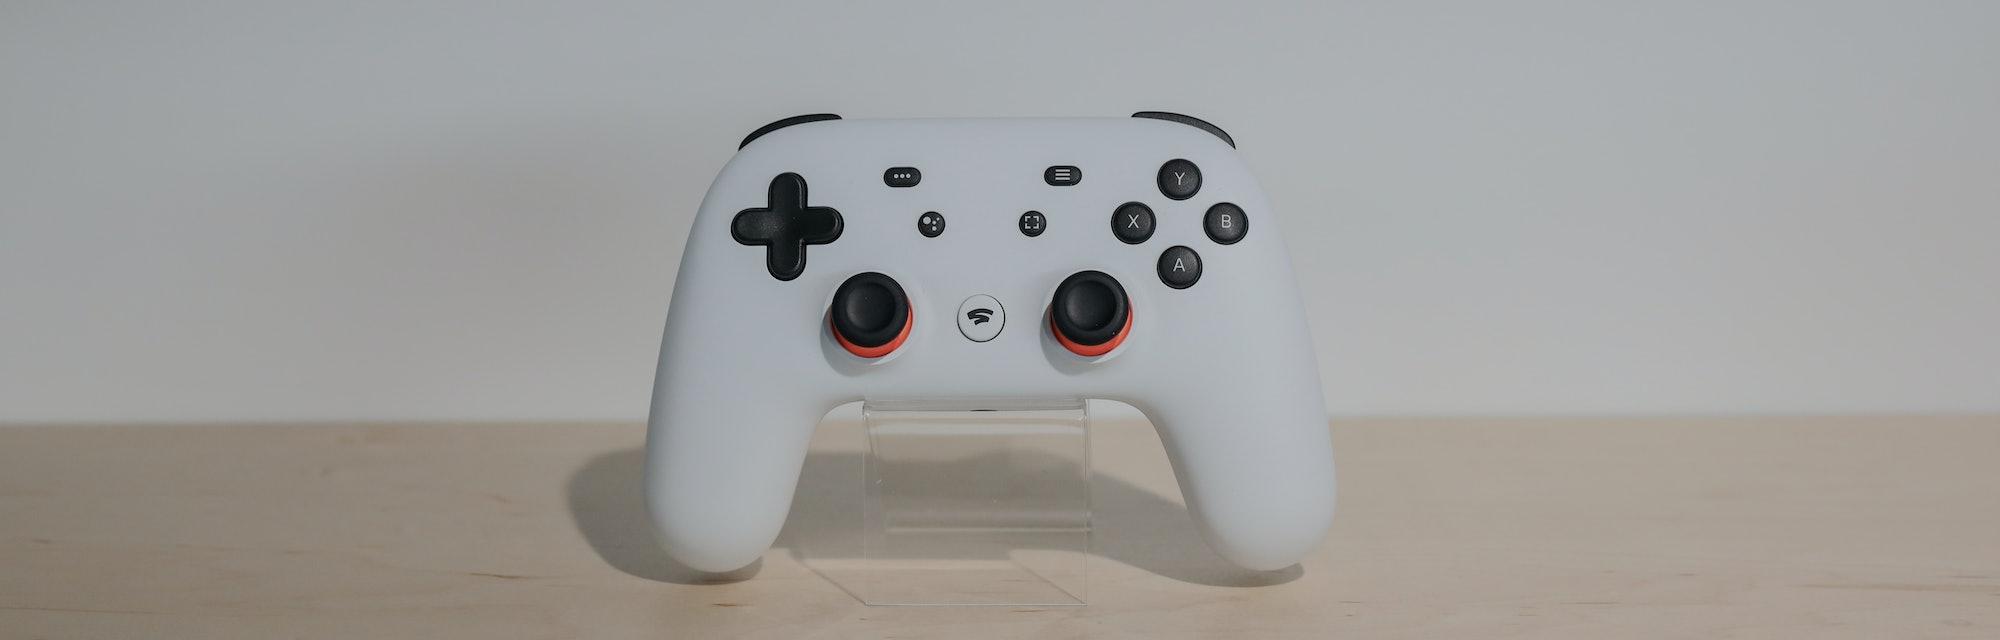 Google Stadia gaming controller.